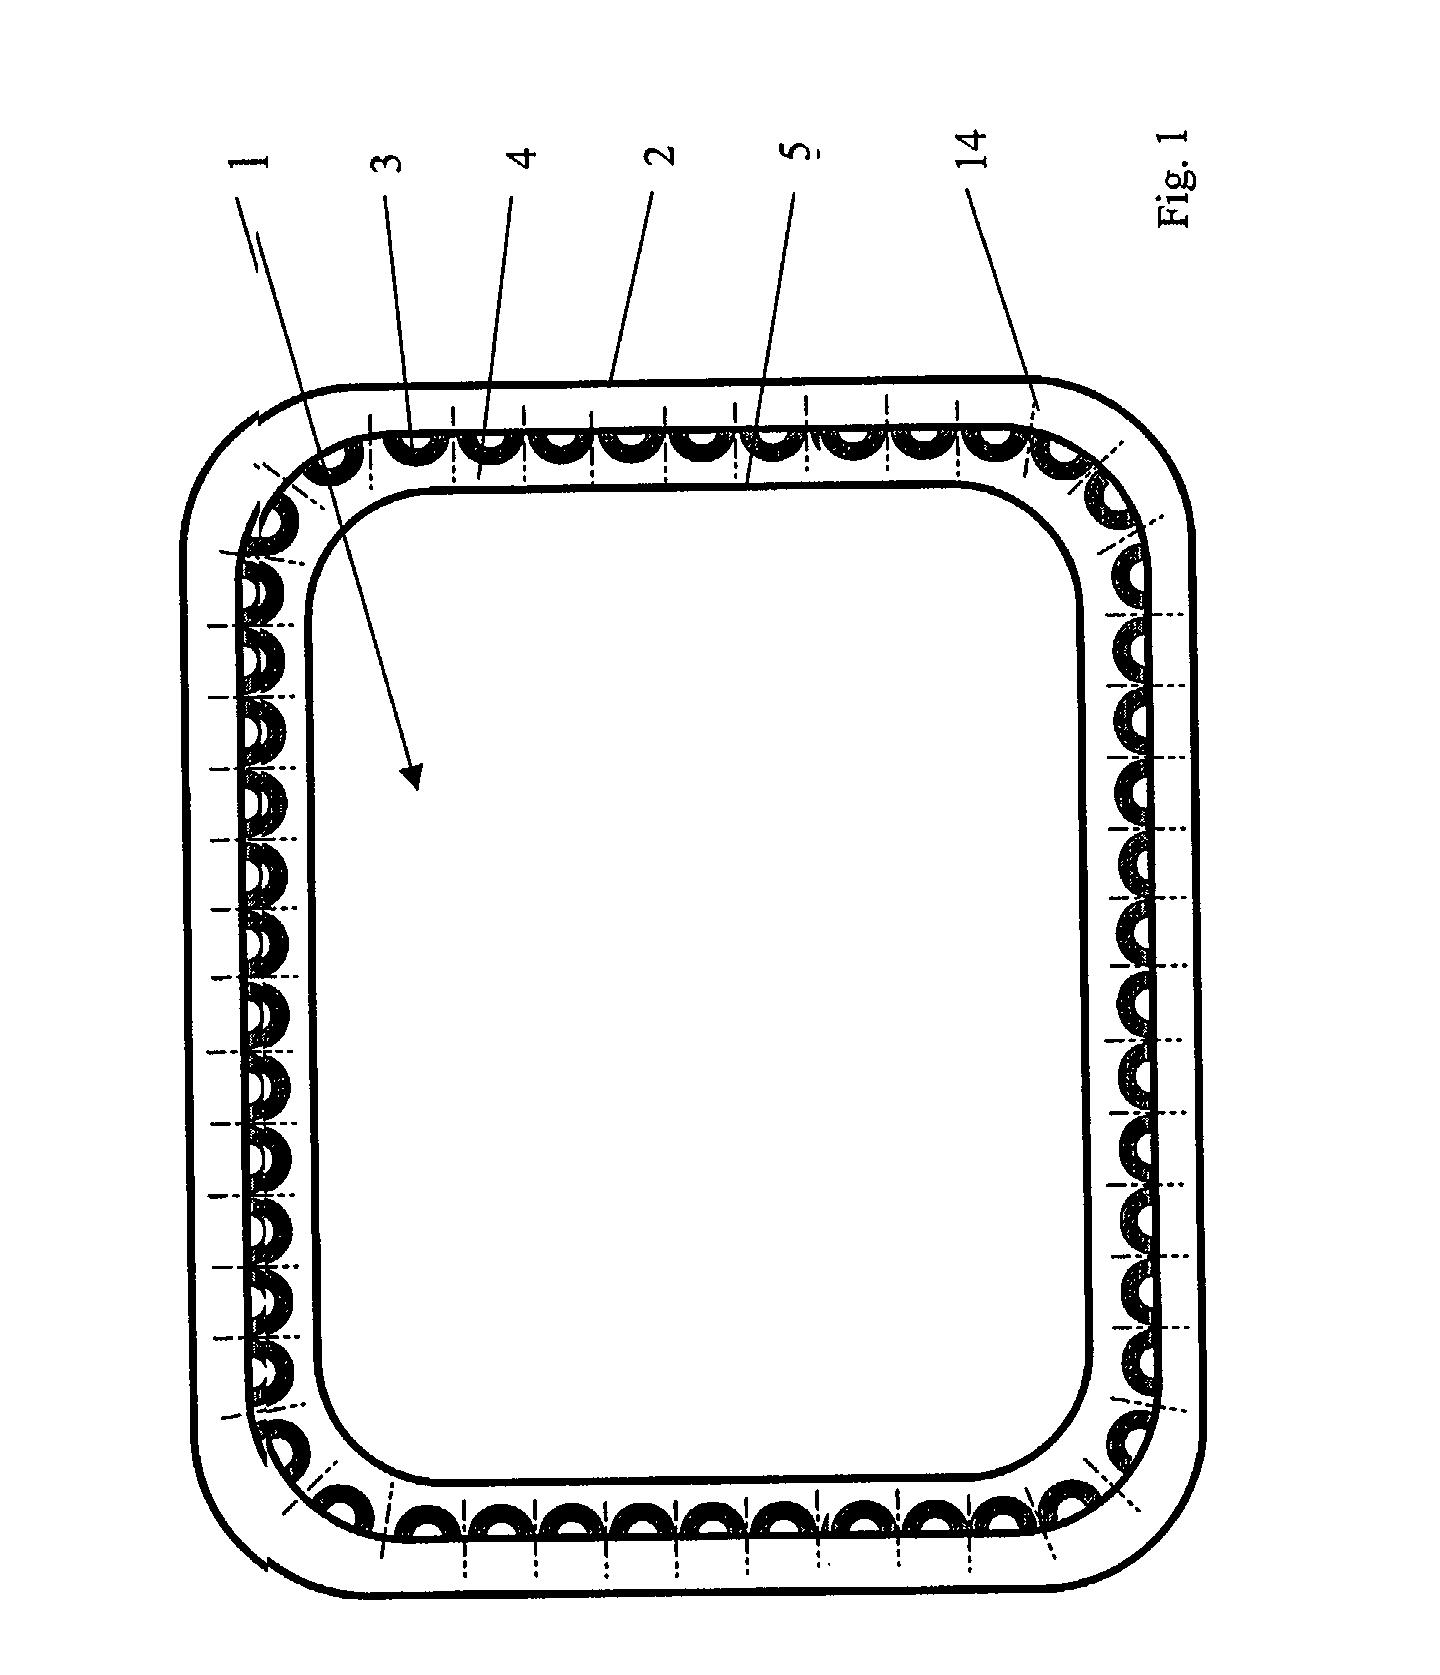 ppt 背景 背景图片 边框 模板 设计 相框 1440_1675